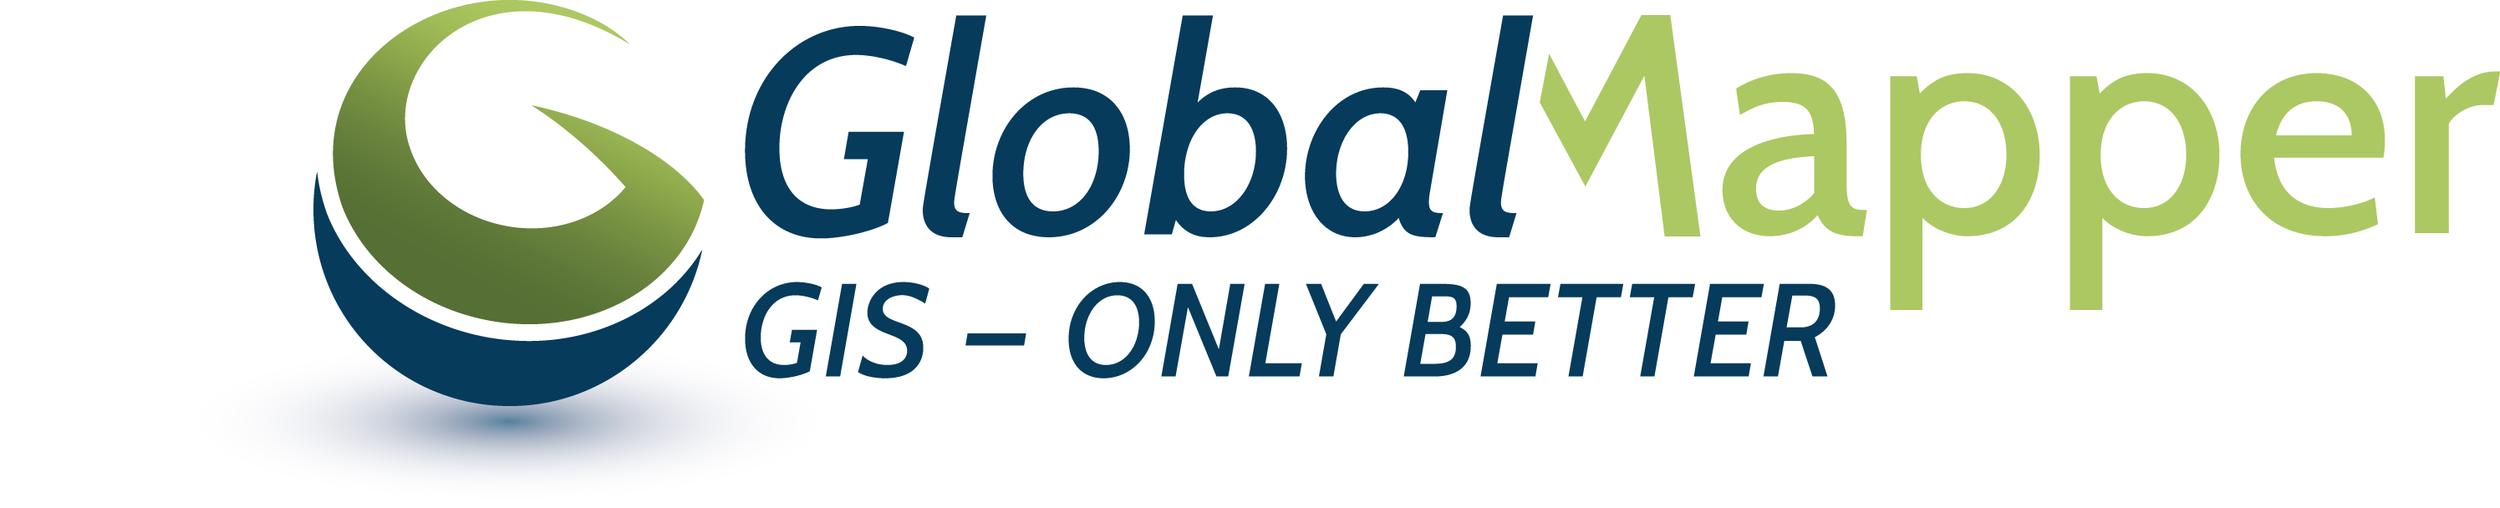 Global-Mapper-Horizontal_RGB.png